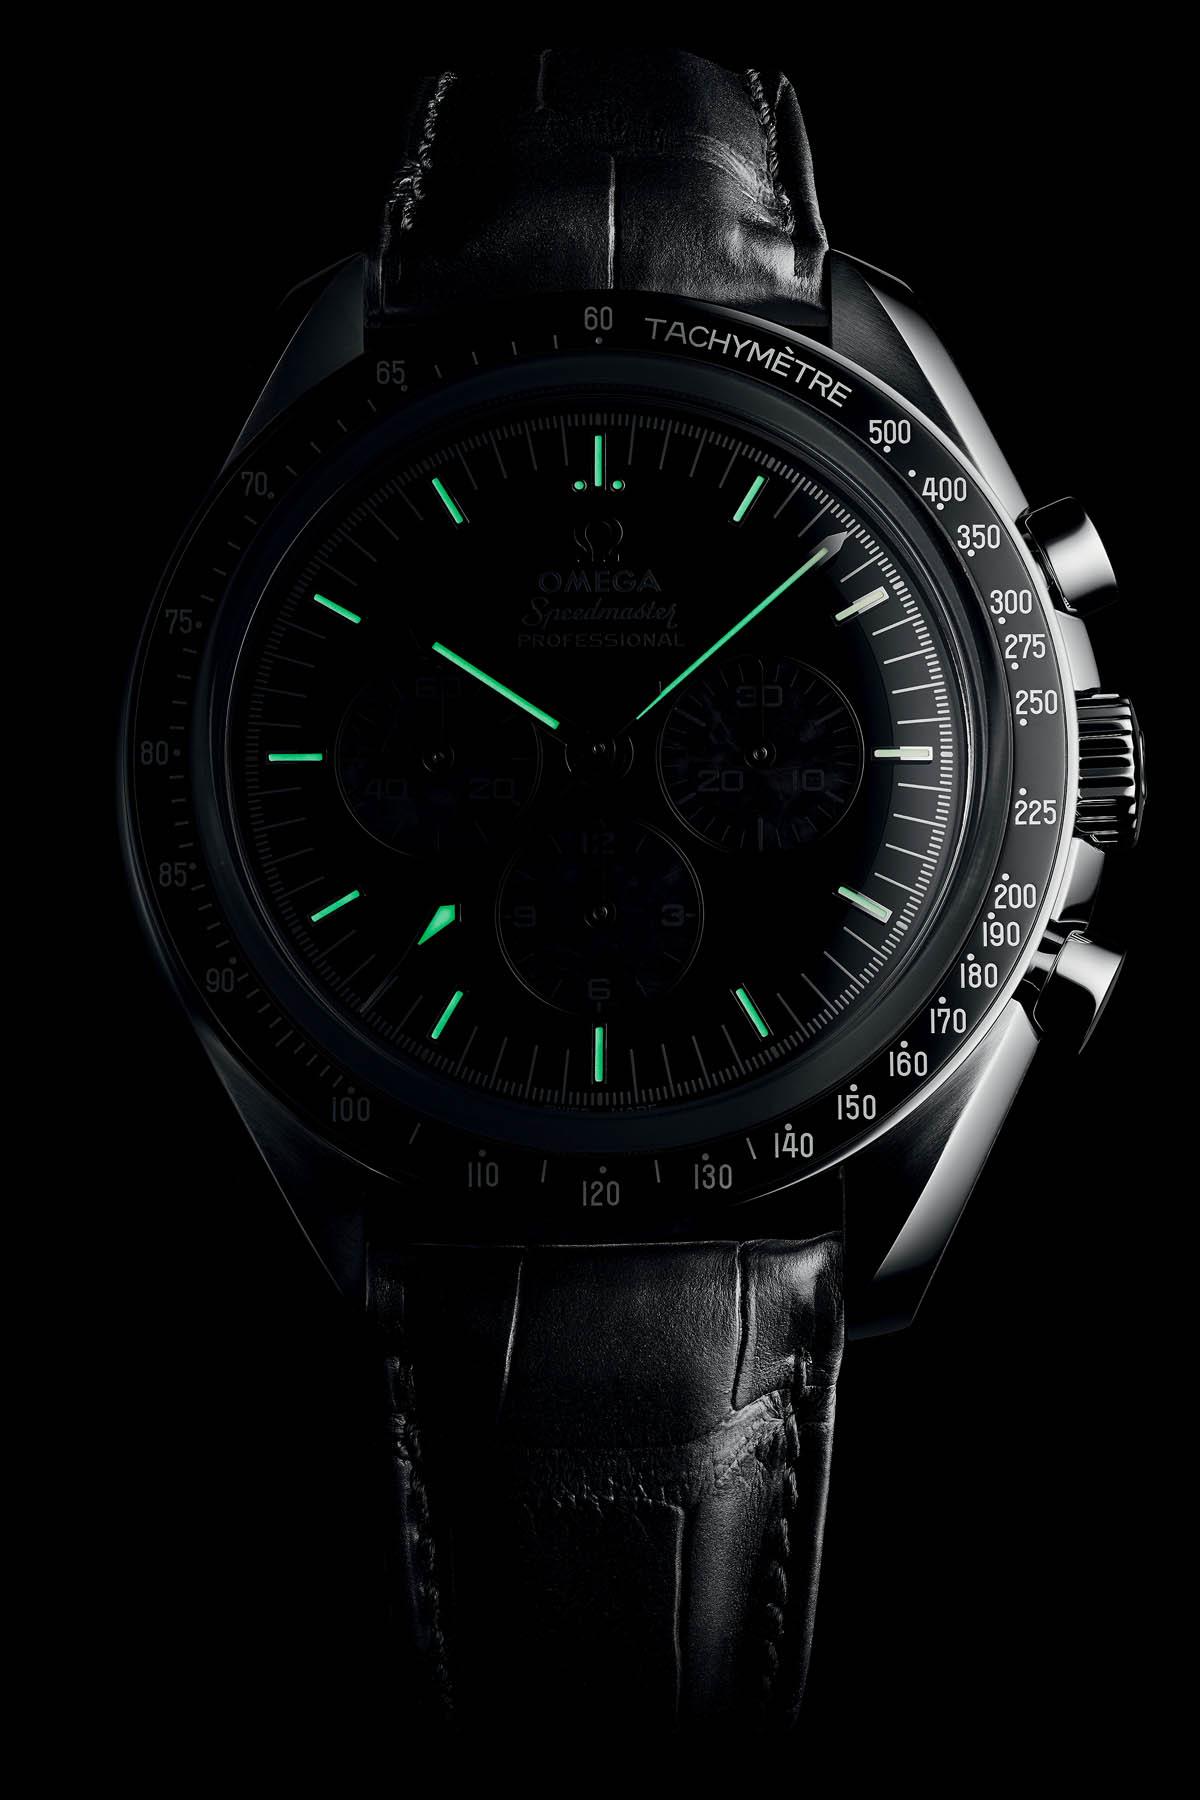 Omega's new Speedmaster Moonwatch 321 Platinum  Omega-Speedmaster-Moonwatch-321-Platinum-311-93-42-30-99-001-Moon-Landing-50-6